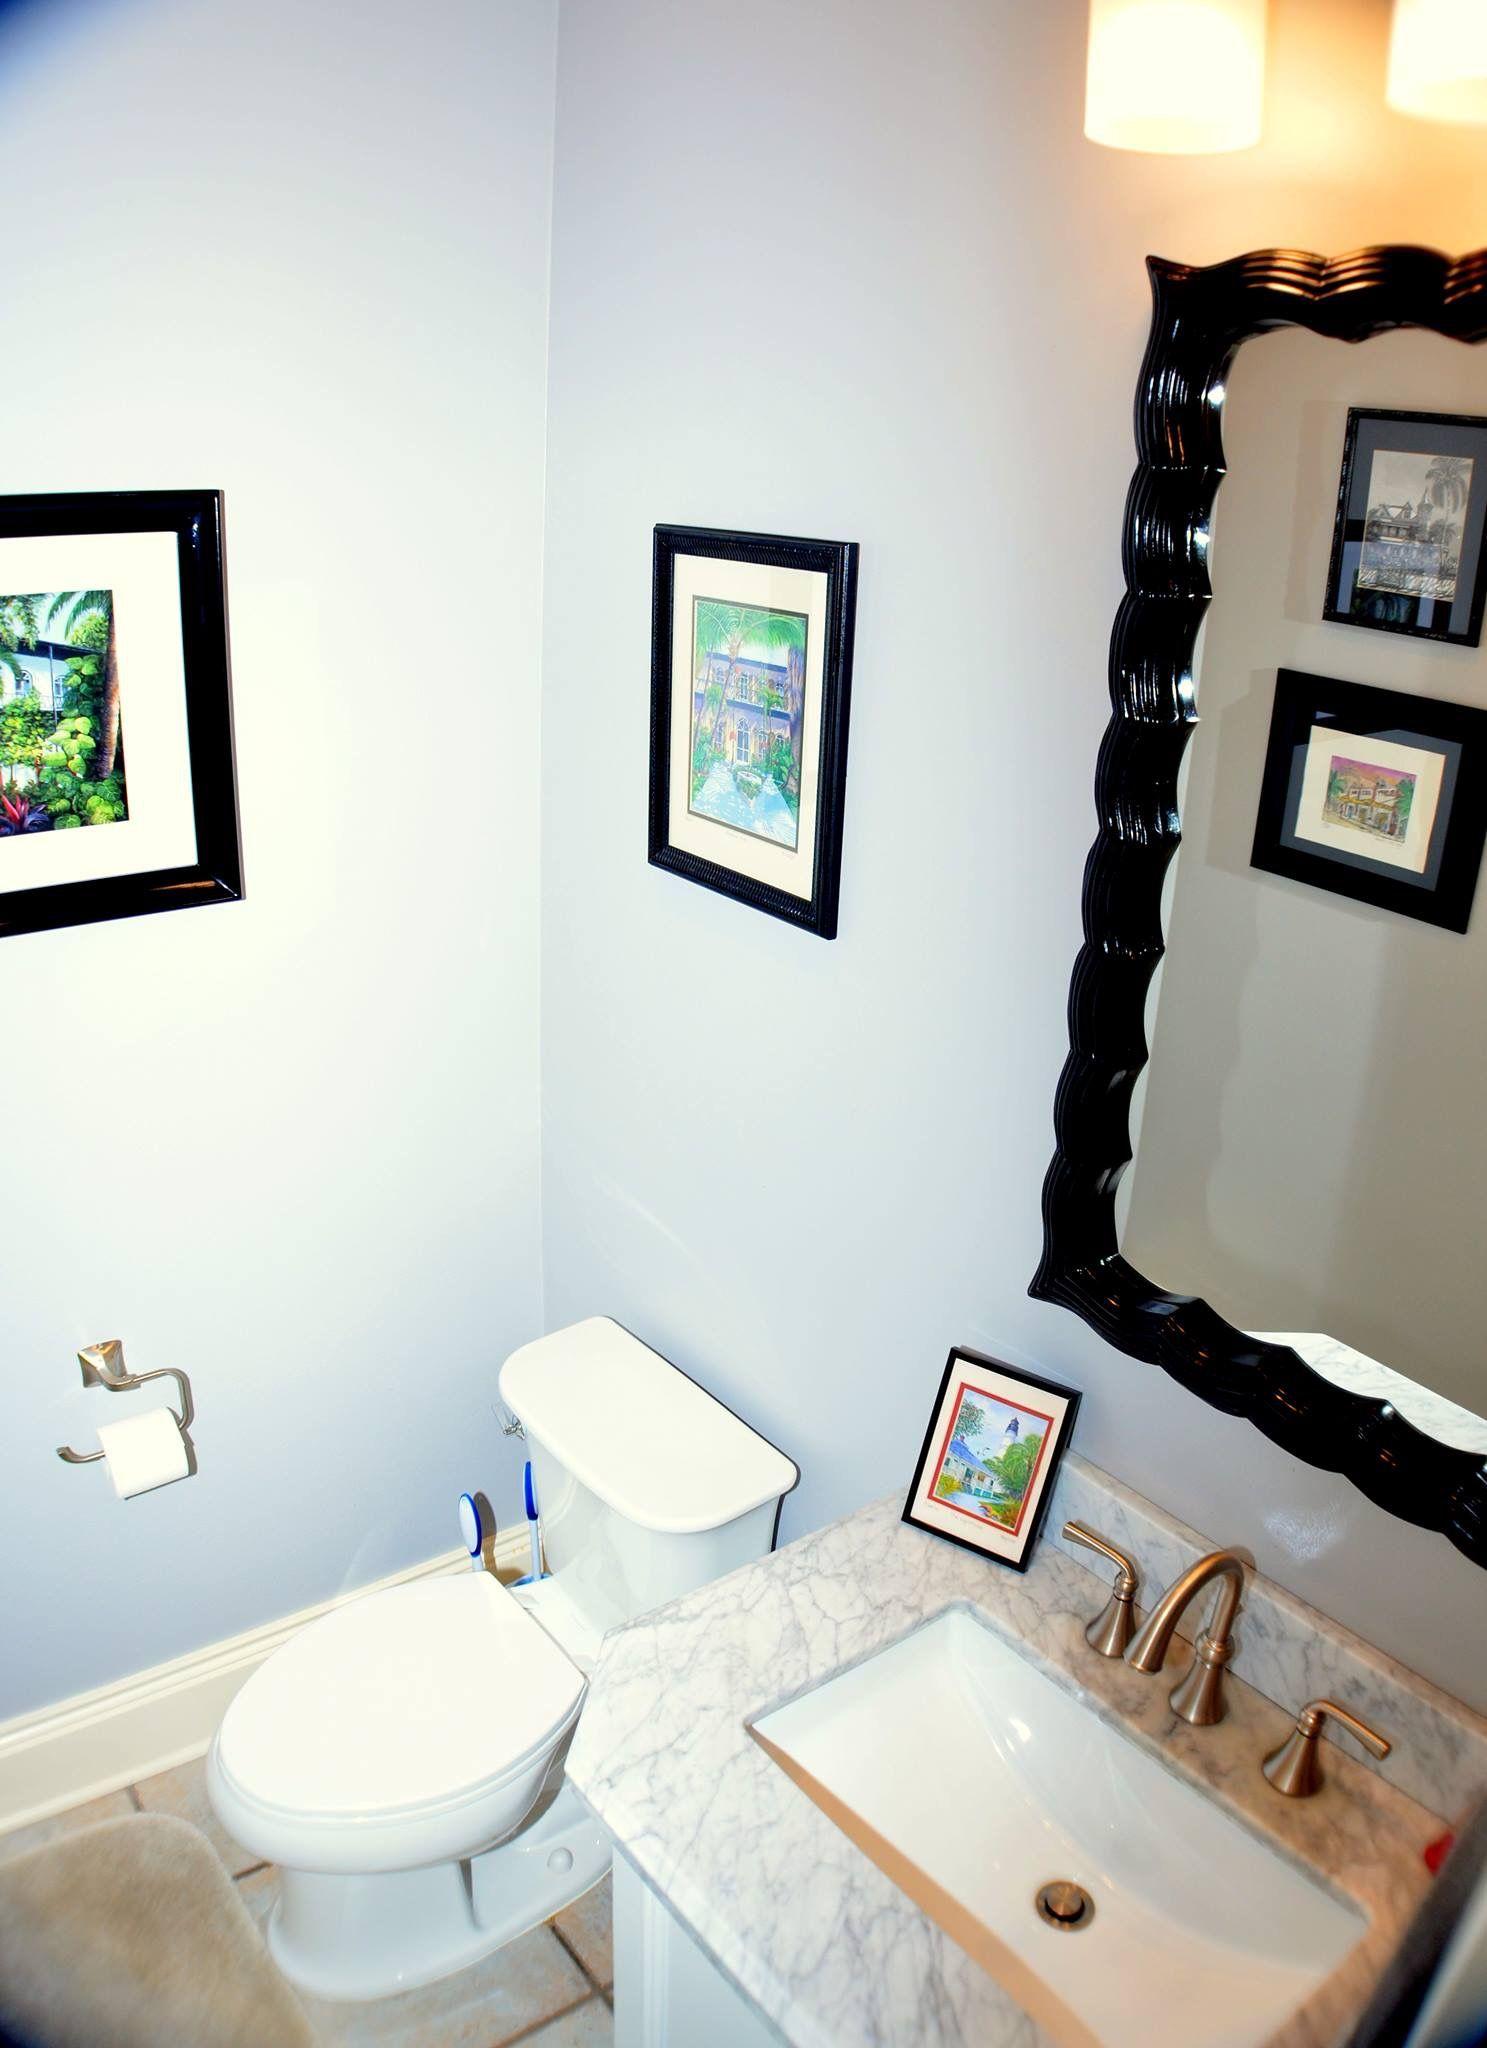 Pin By Joann Boyd Harper On 90 N Magnolia A Drive Covington La 70433 Vanity Bathroom Magnolia